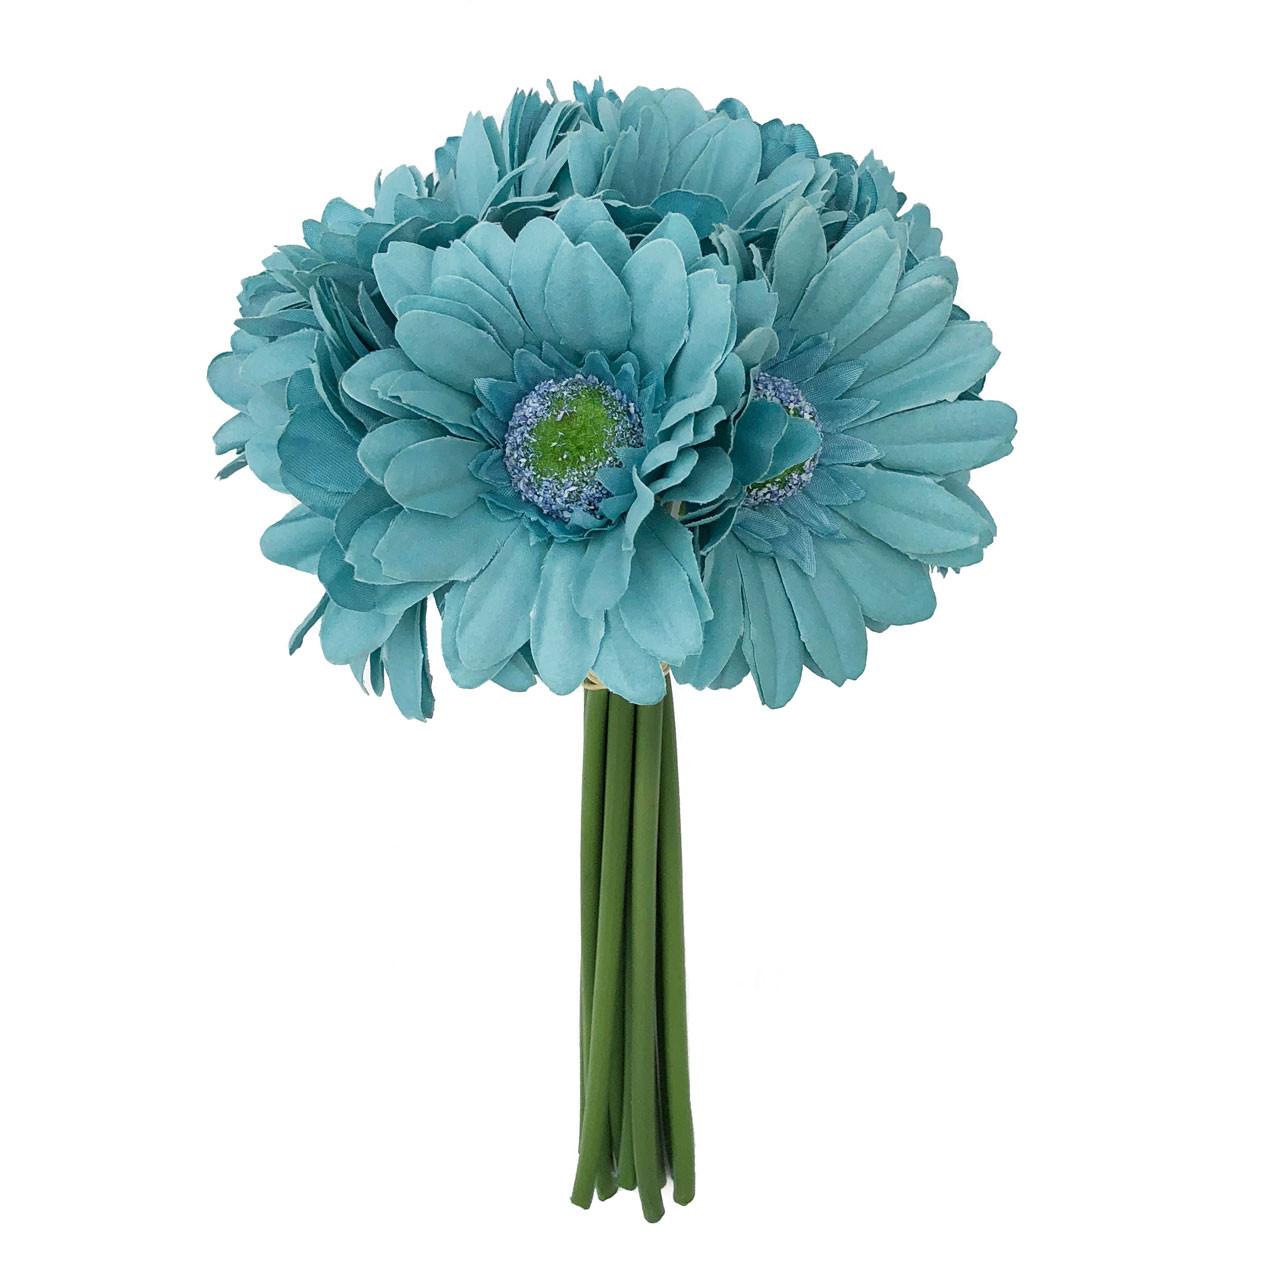 Small Blue Flowers For Weddings: Aqua Blue Daisy Bouquet Small